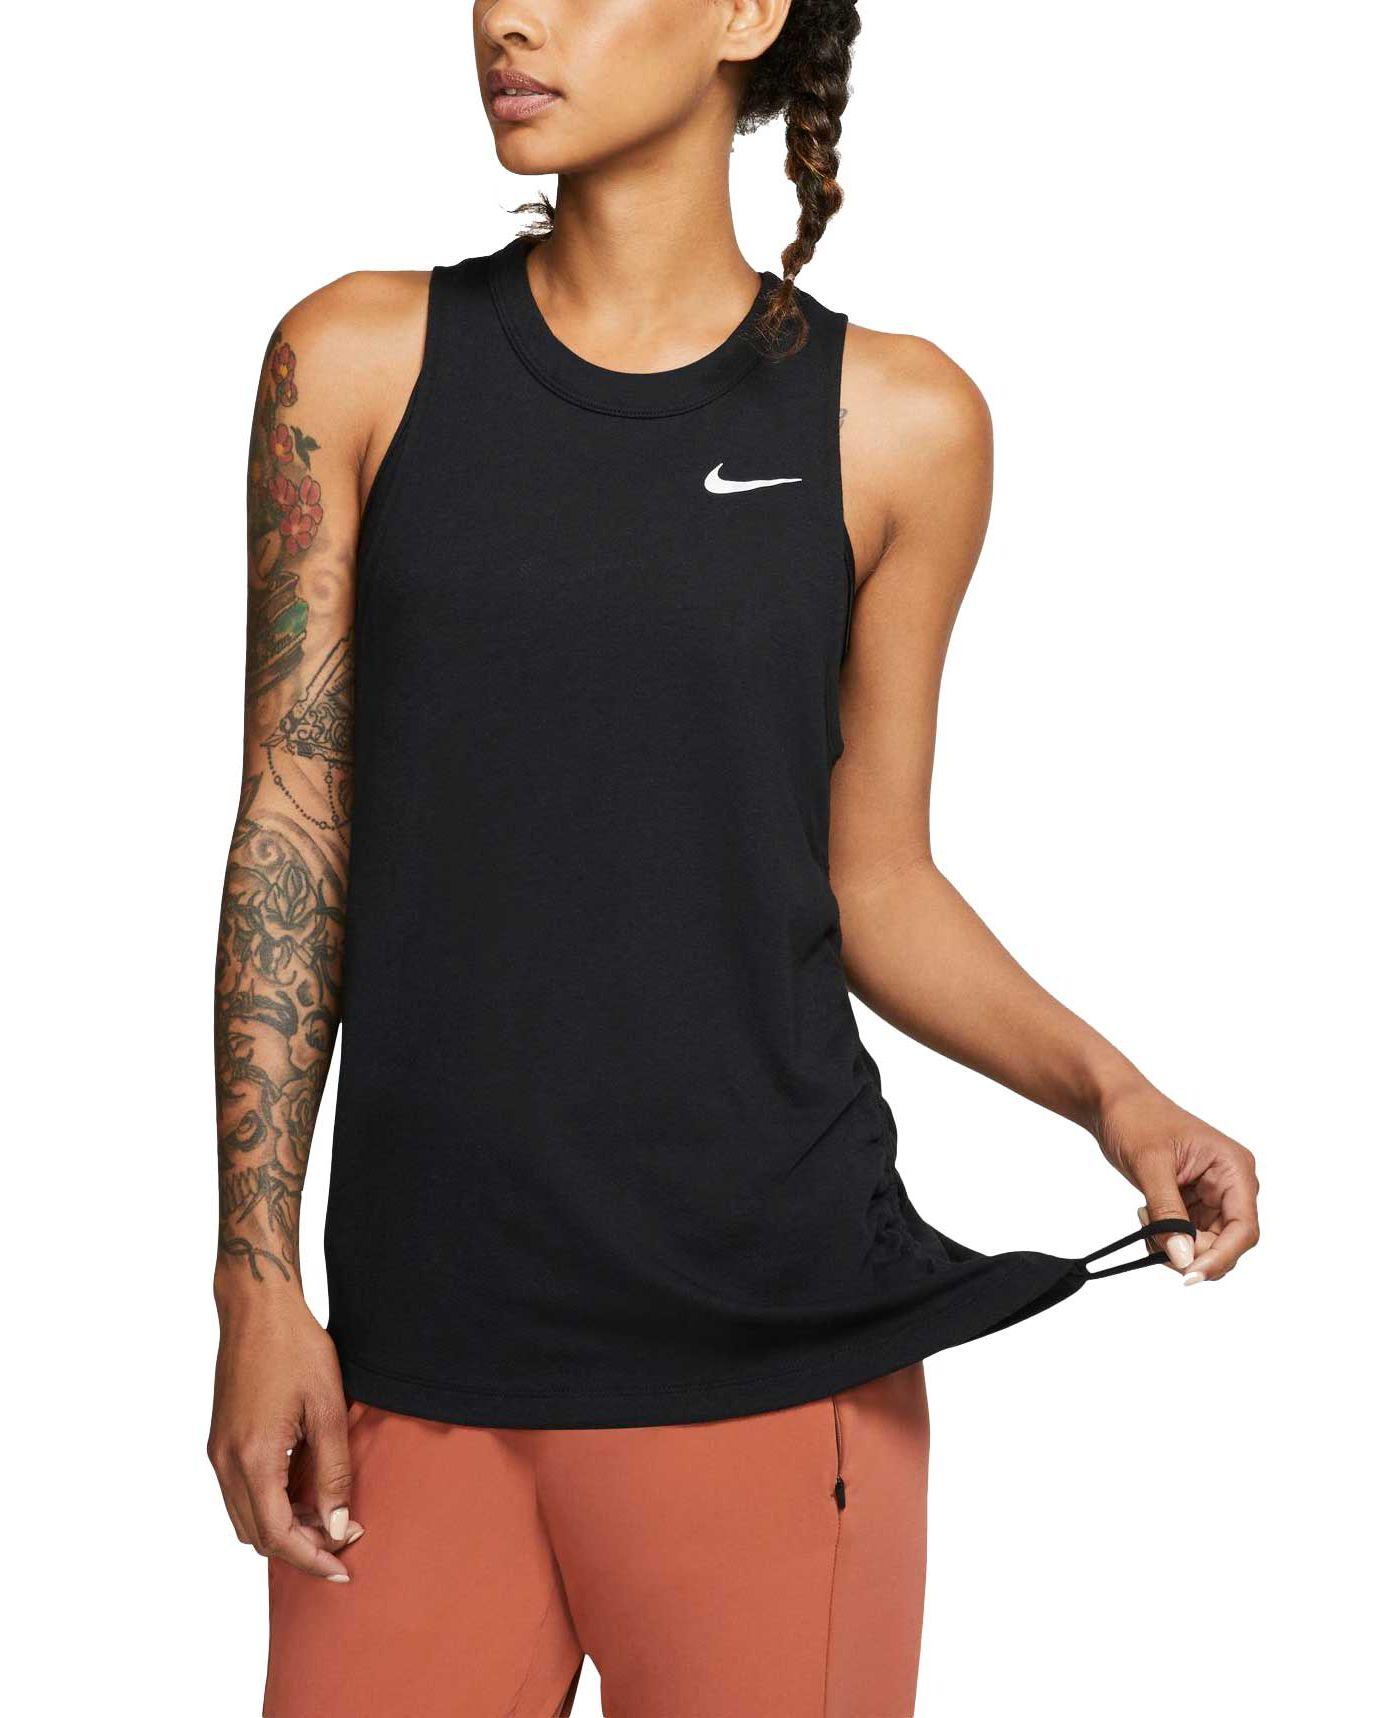 Nike Women's Cinched Miler Running Tank Top